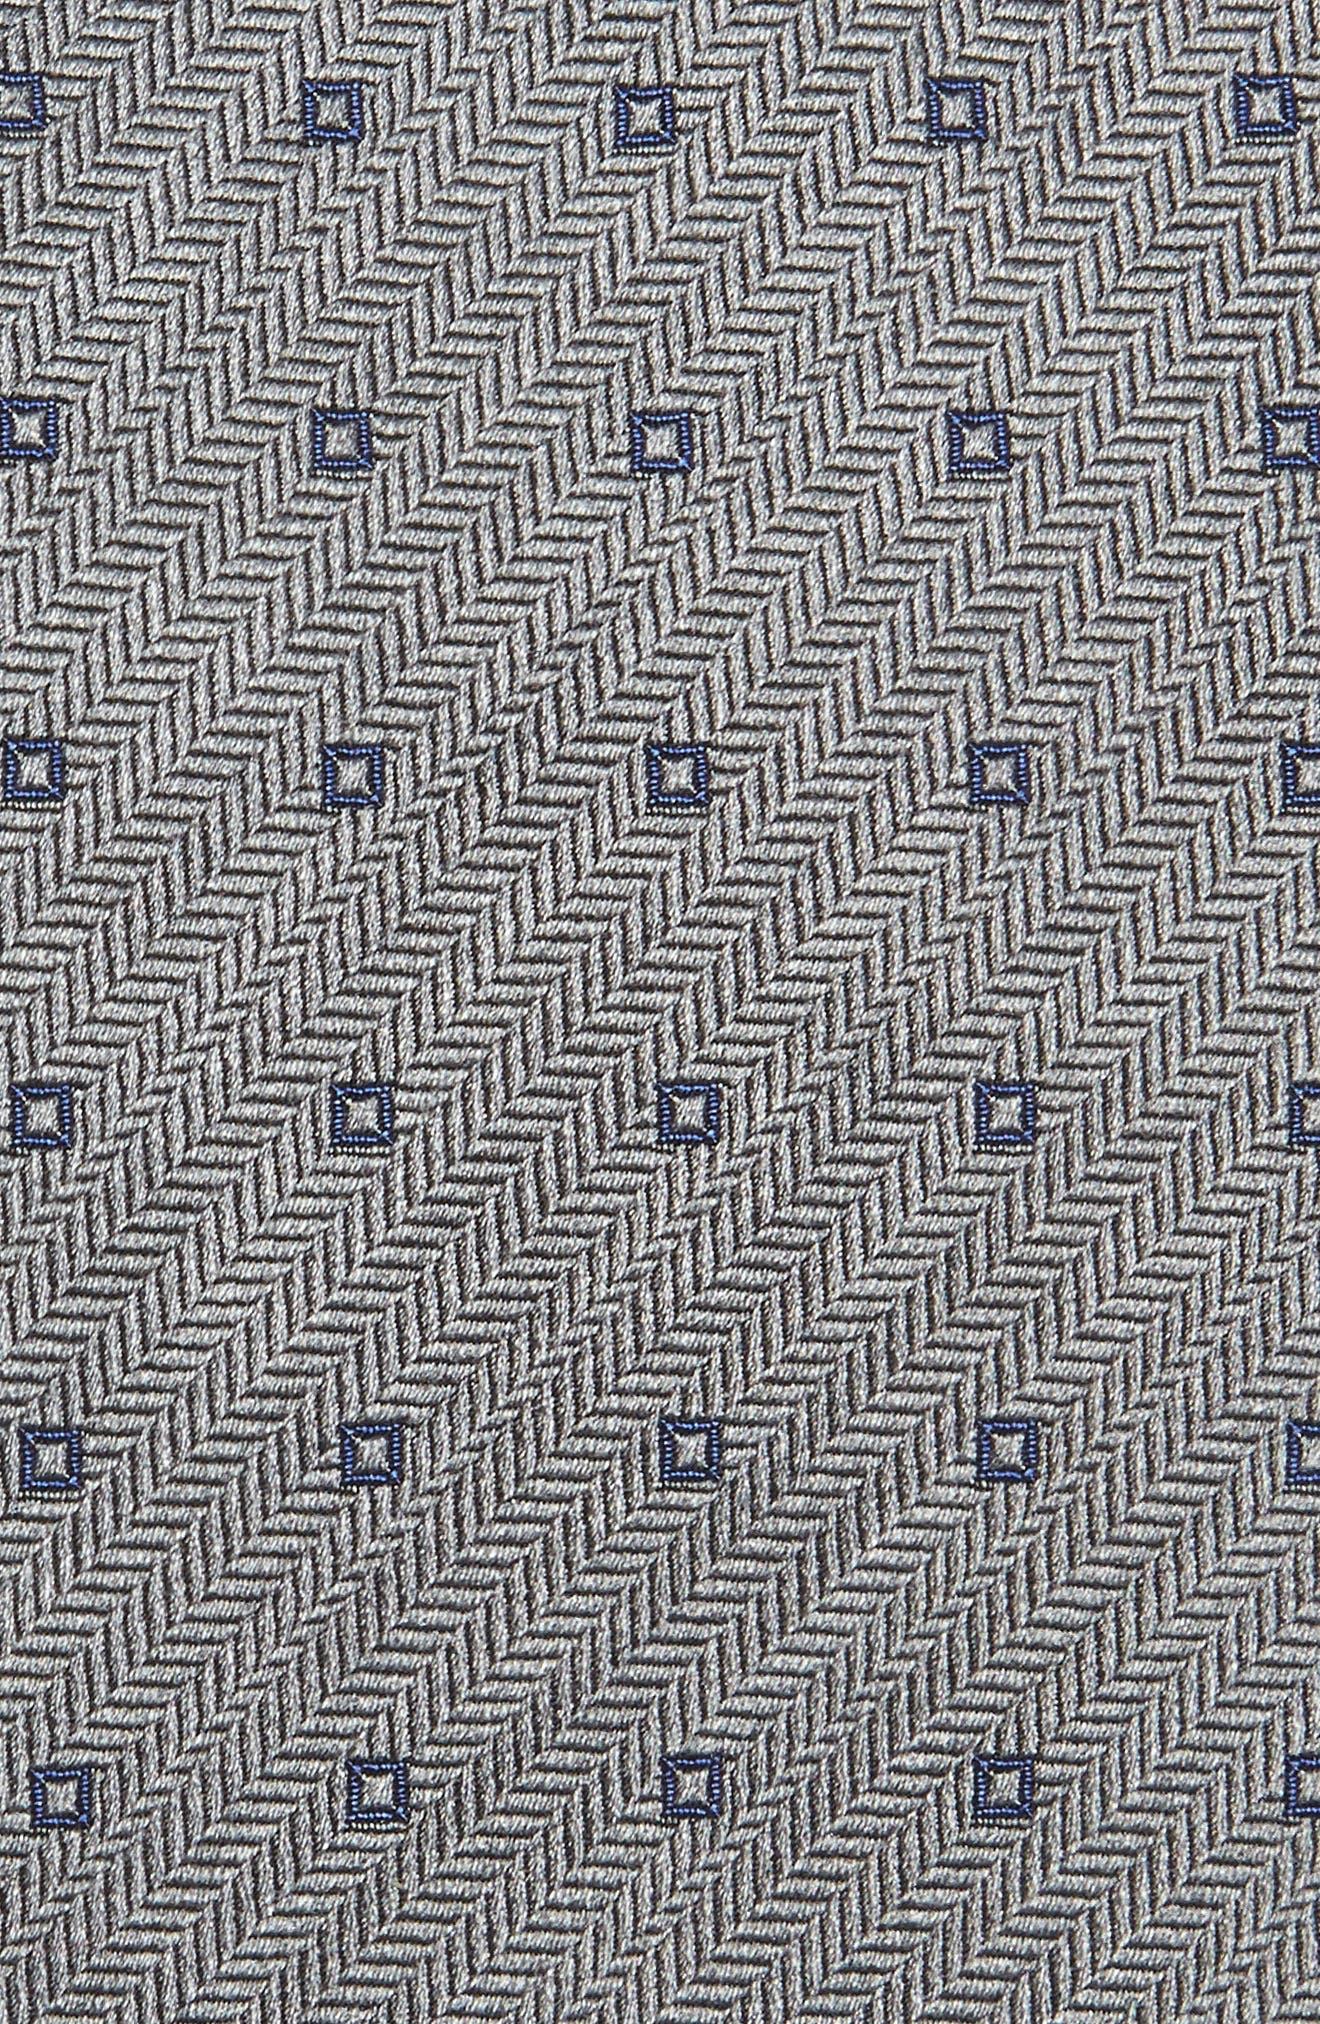 Square Dot Silk Tie,                             Alternate thumbnail 2, color,                             Charcoal/ Blue